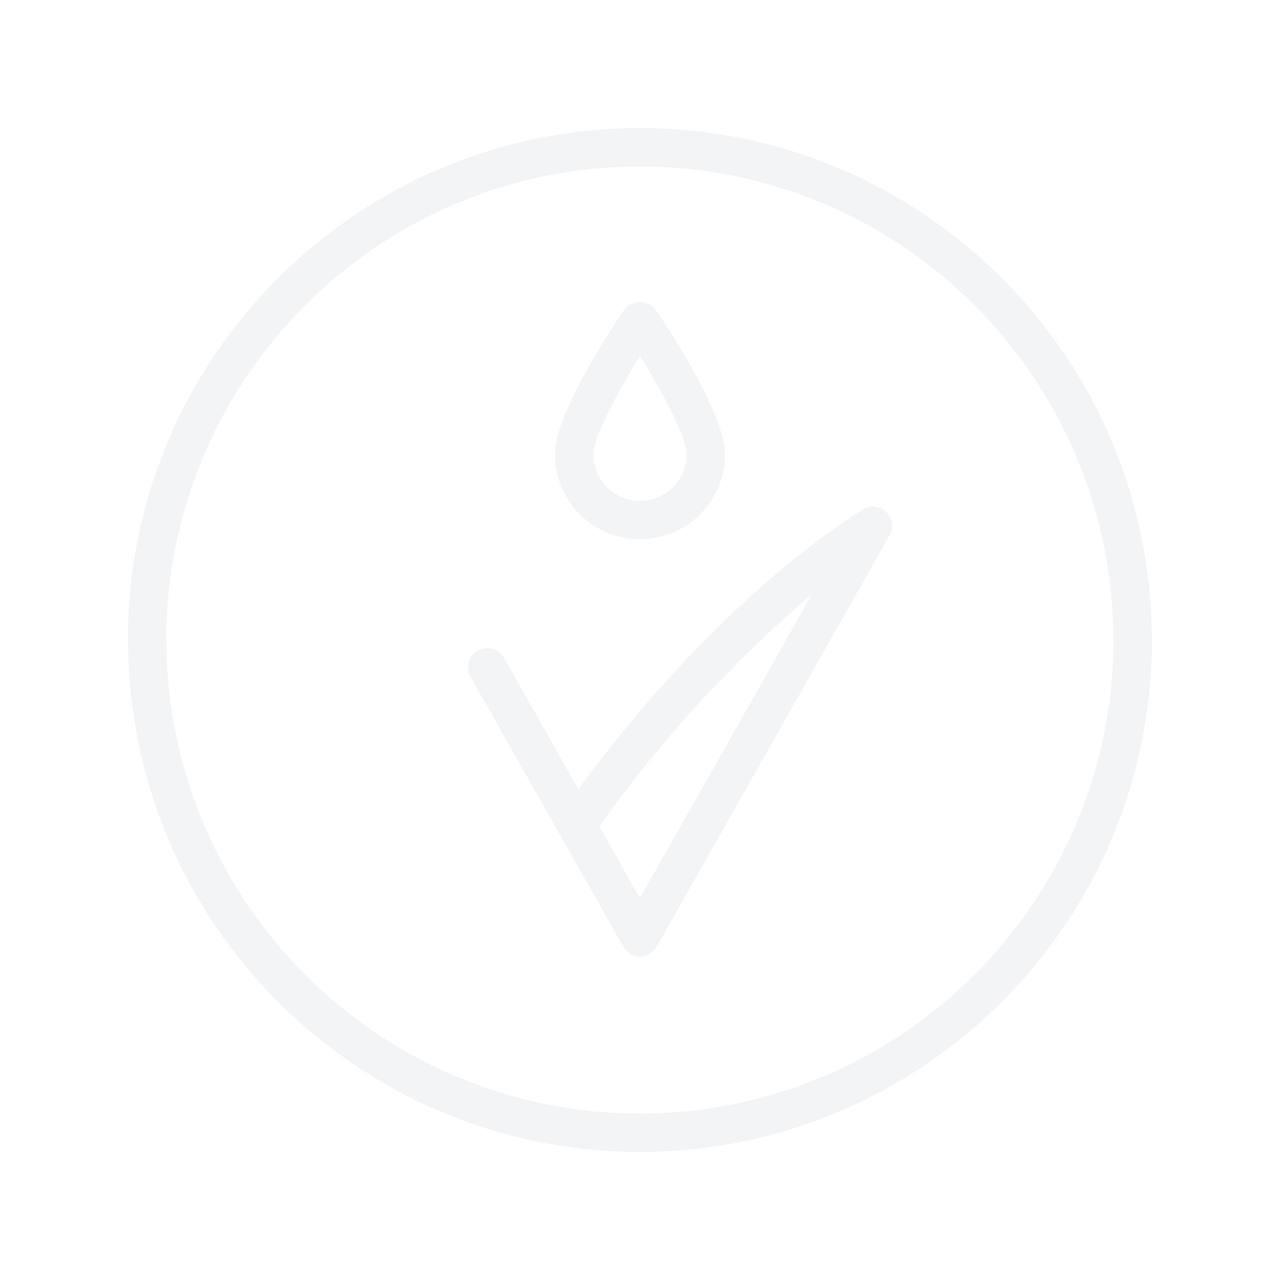 Max Factor Kohl Eyeliner Pencil No.020 Black